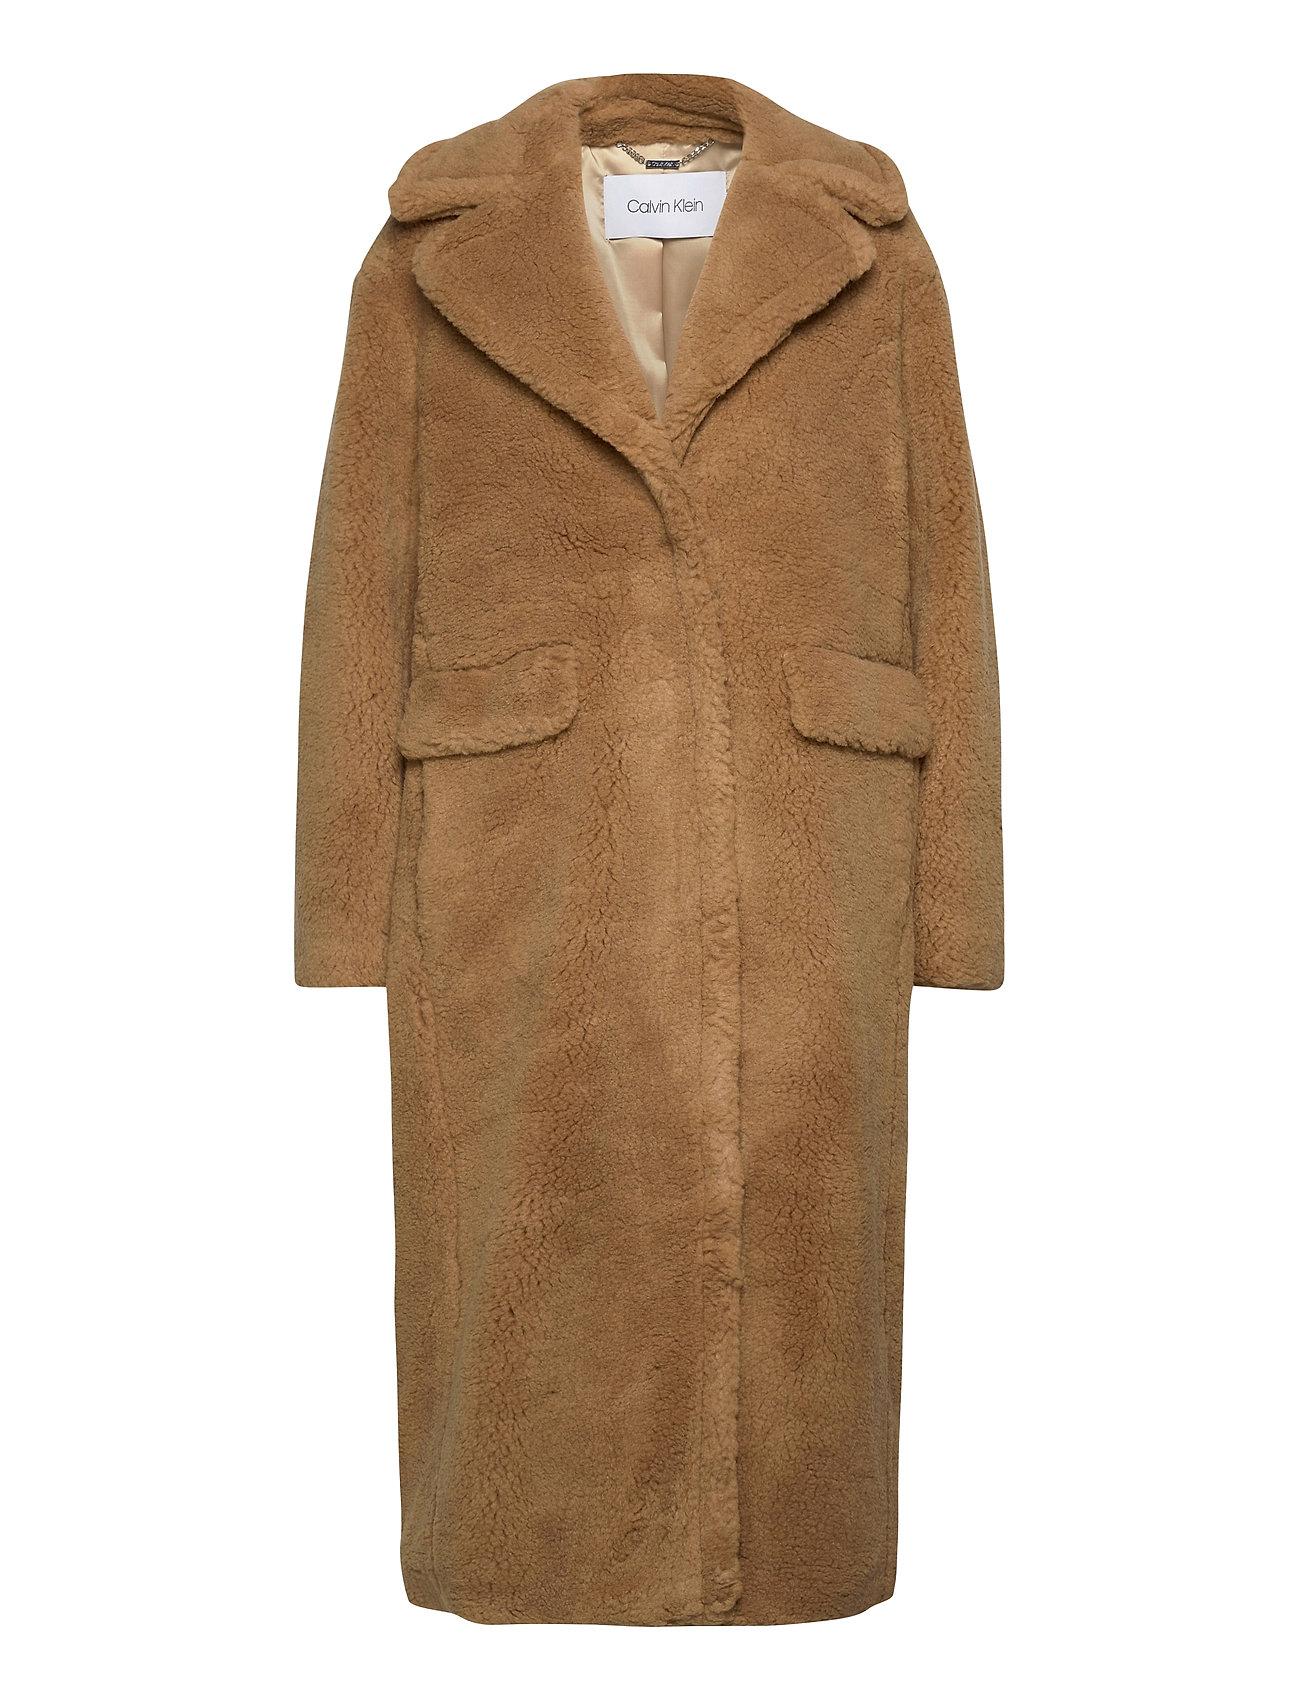 CALVIN KLEIN Mäntel | Teddy Coat Mantel Jacke Beige CALVIN KLEIN